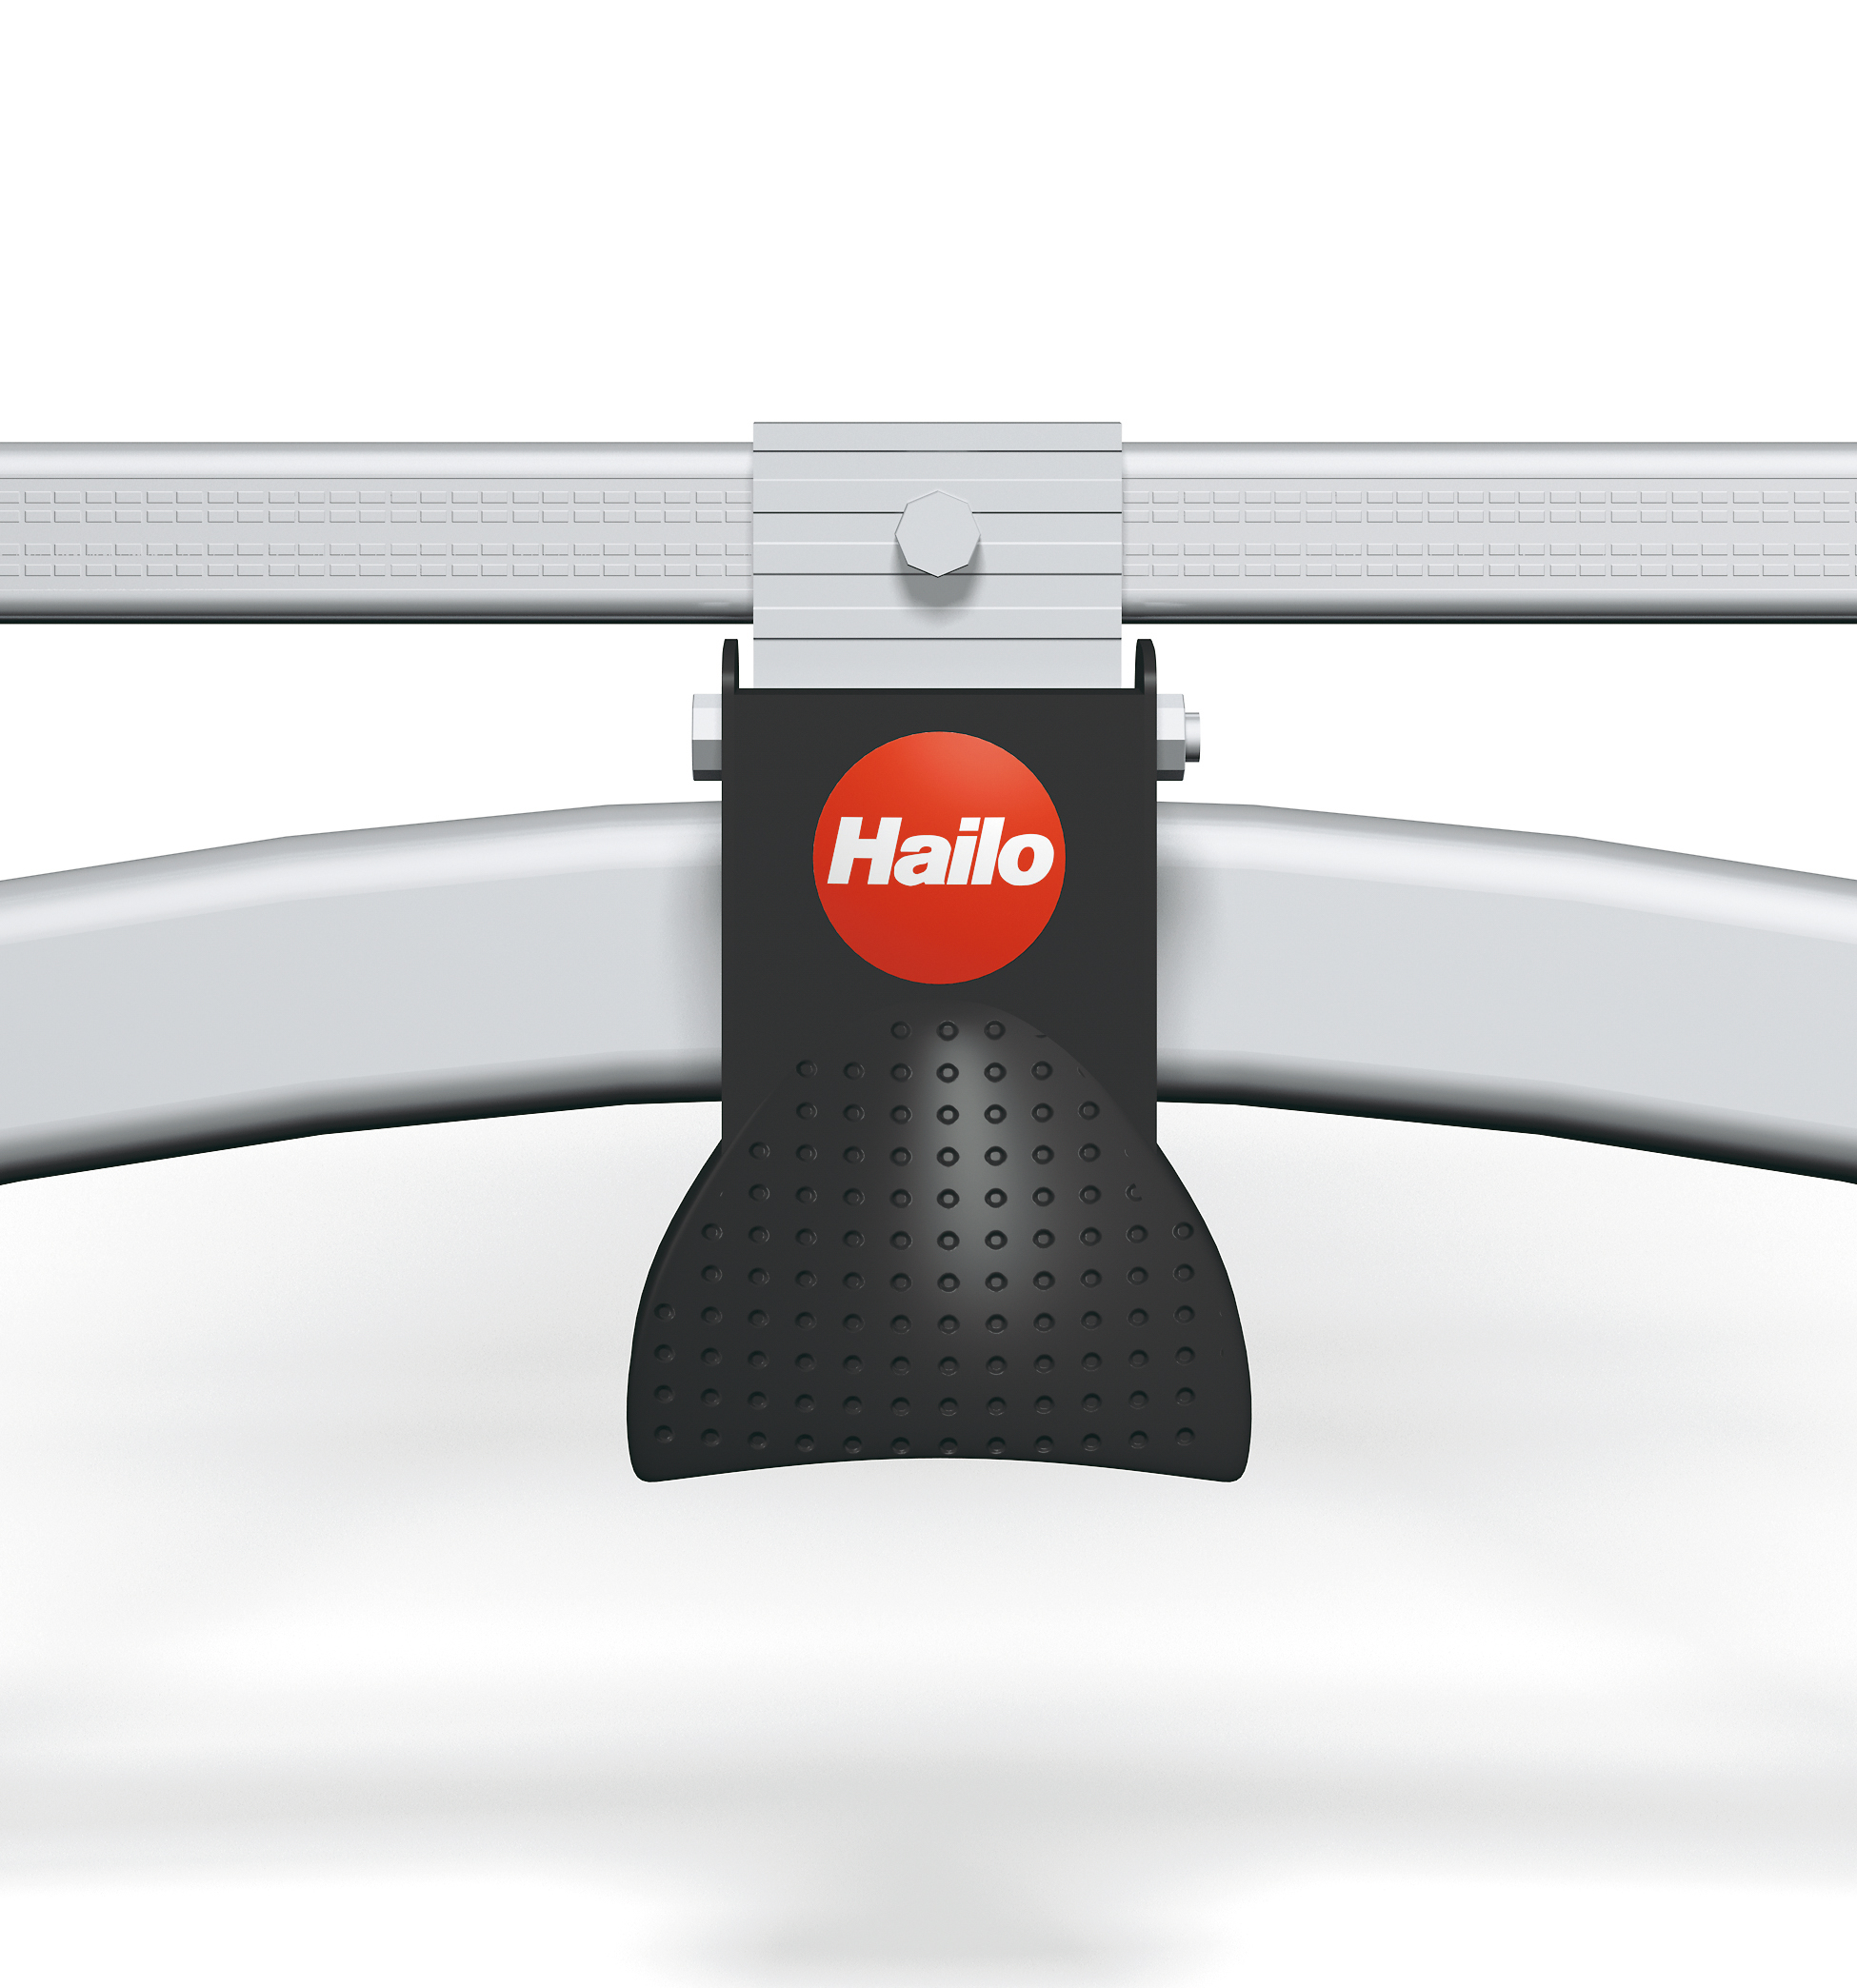 hailo profilot aluminium kombileiter 3 teilig versch ausf hrungen ebay. Black Bedroom Furniture Sets. Home Design Ideas